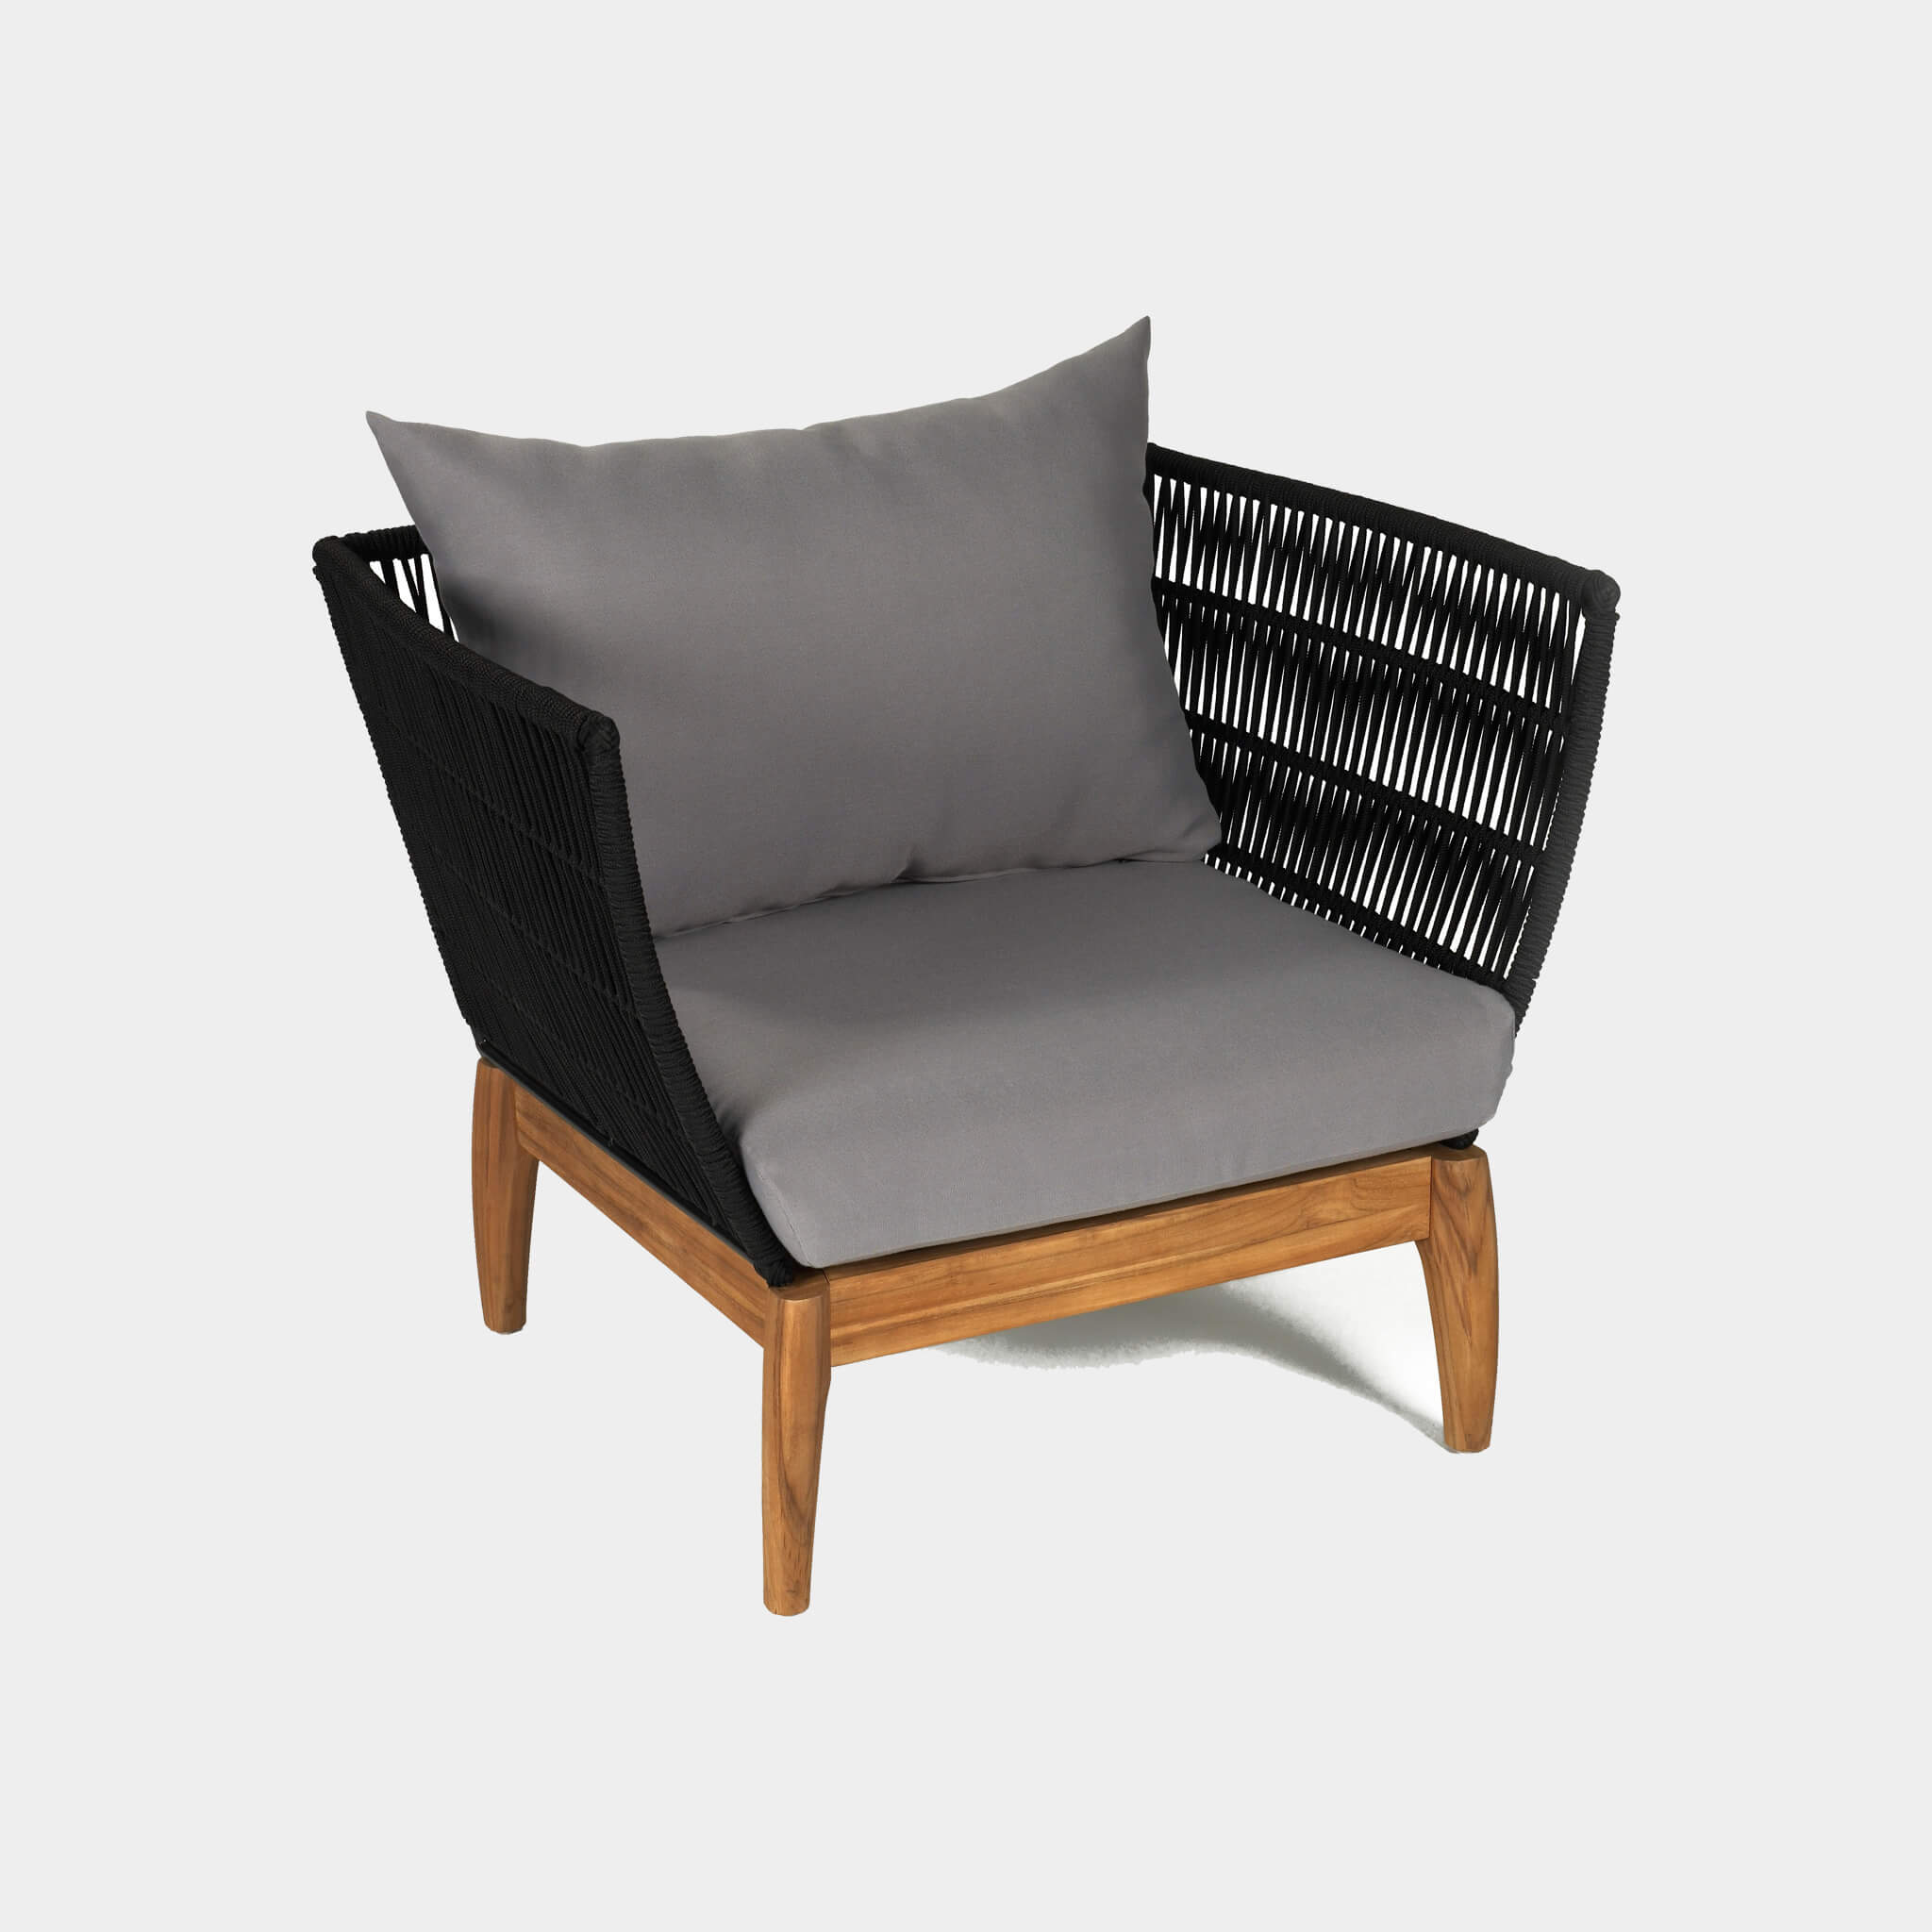 stressless sessel selbst beziehen williamflooring. Black Bedroom Furniture Sets. Home Design Ideas